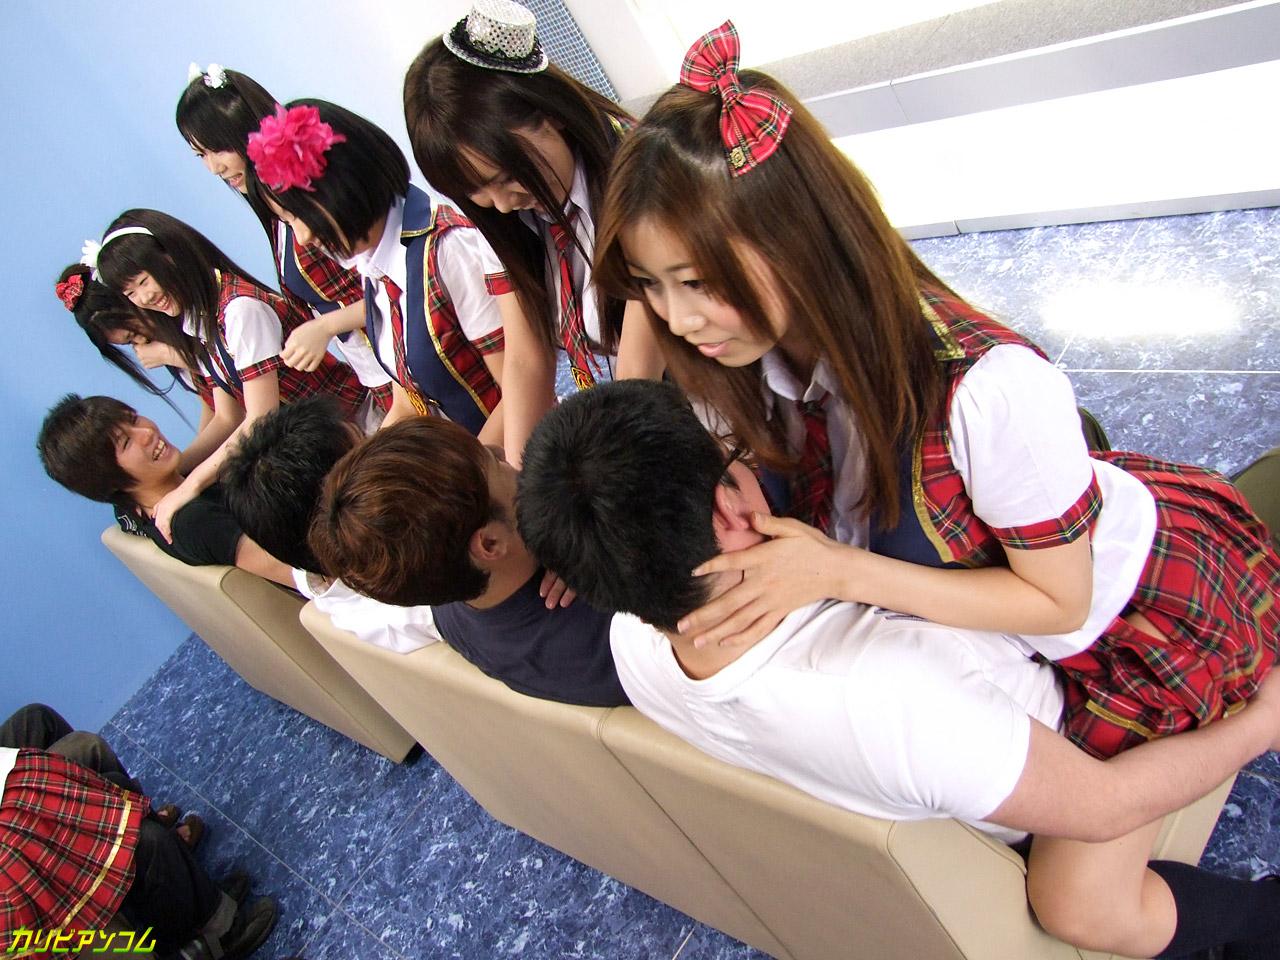 CRB48 新人選抜総選挙 稲川なつめ 美緒みくる 河西ちなみ 他7名